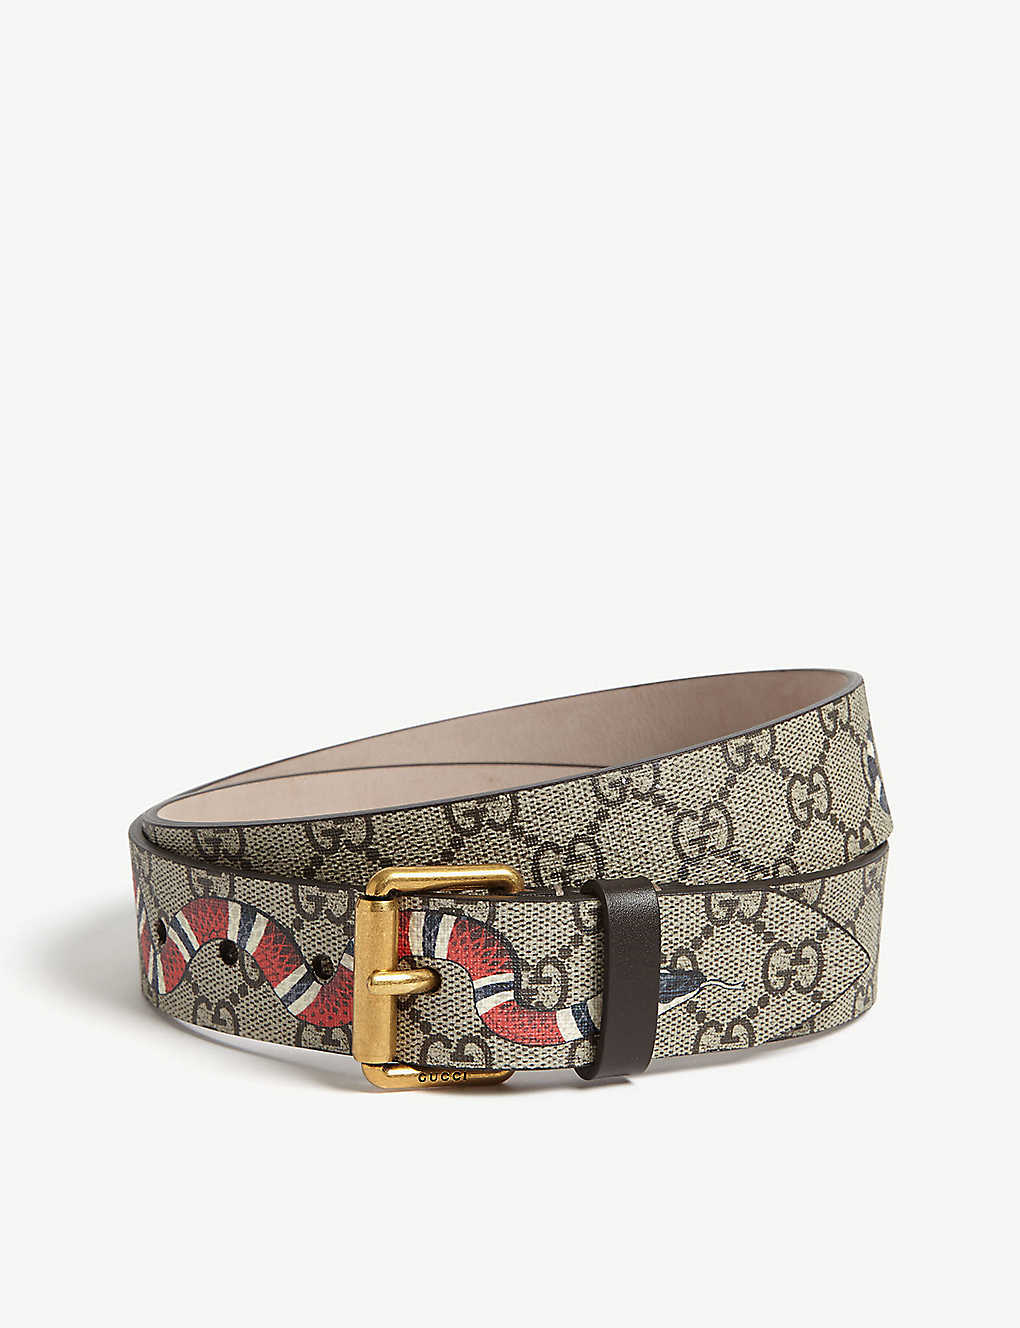 6c637bc3a GUCCI - Snake GG Supreme leather belt | Selfridges.com